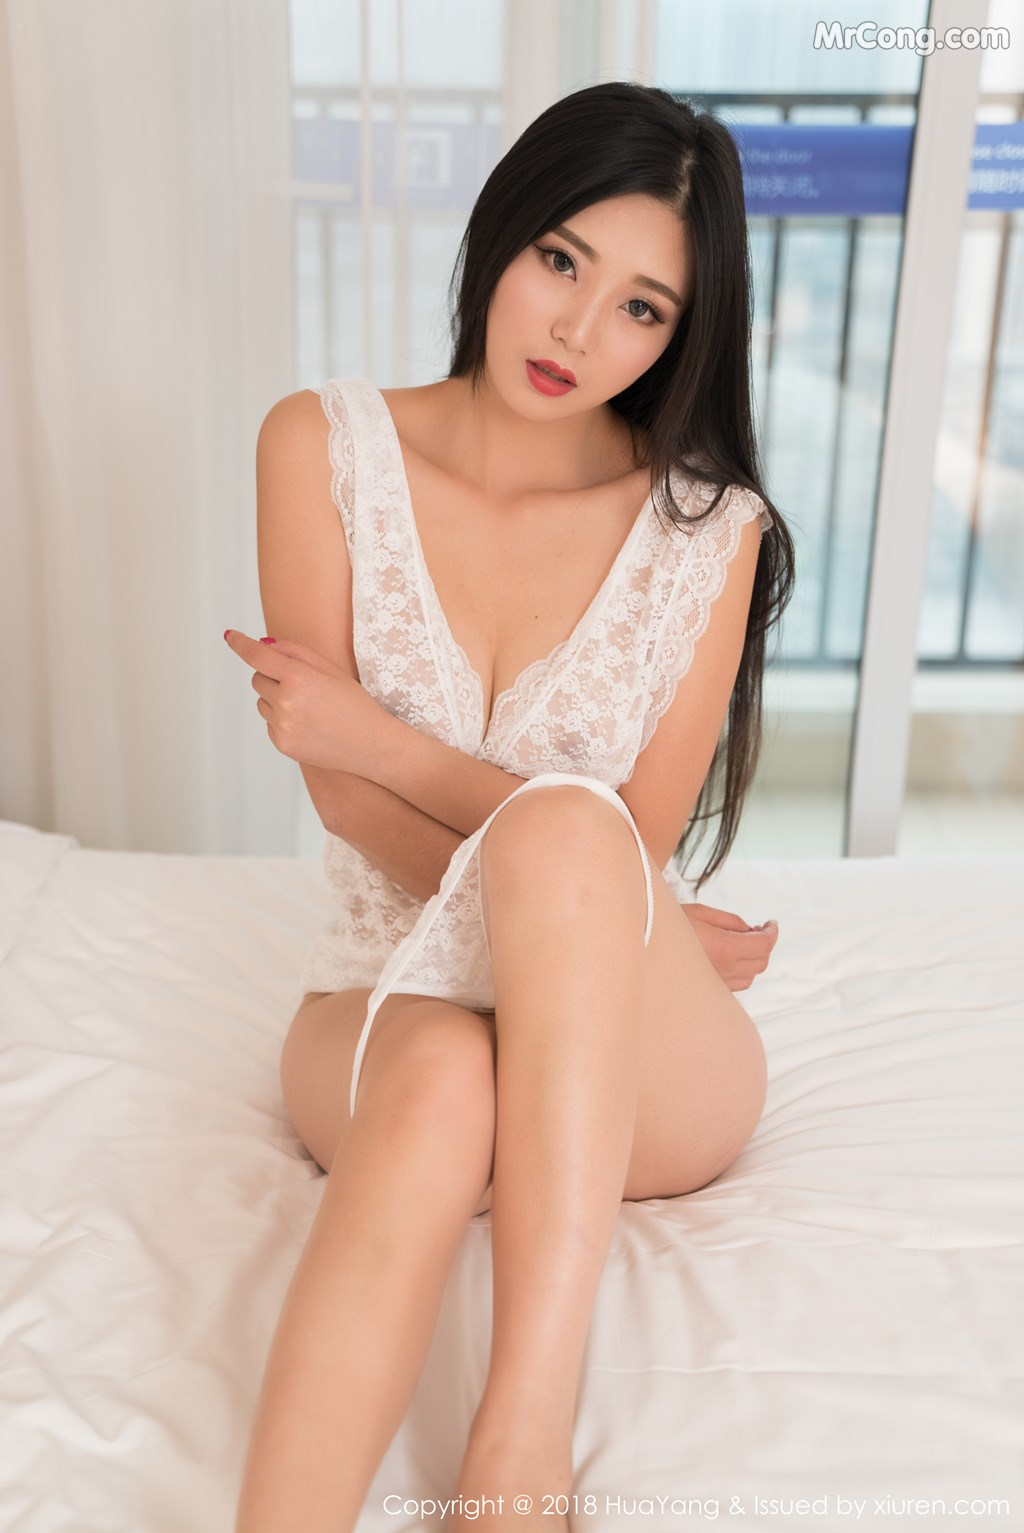 Image HuaYang-2018-02-28-Vol.033-KiKi-MrCong.com-023 in post HuaYang 2018-02-28 Vol.033: Người mẫu 宋-KiKi (42 ảnh)